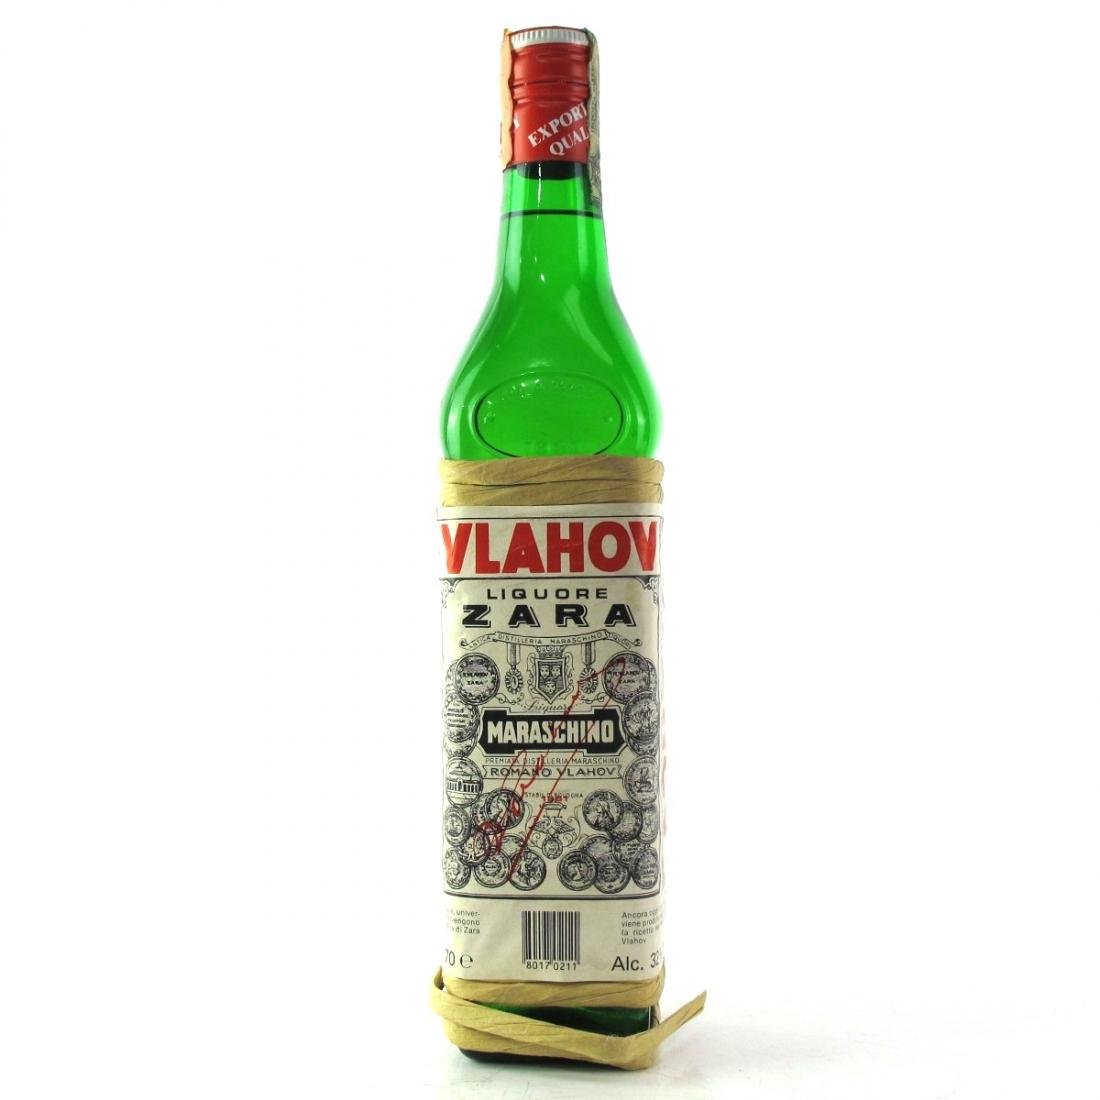 Vlahov Liquore Zara Maraschino